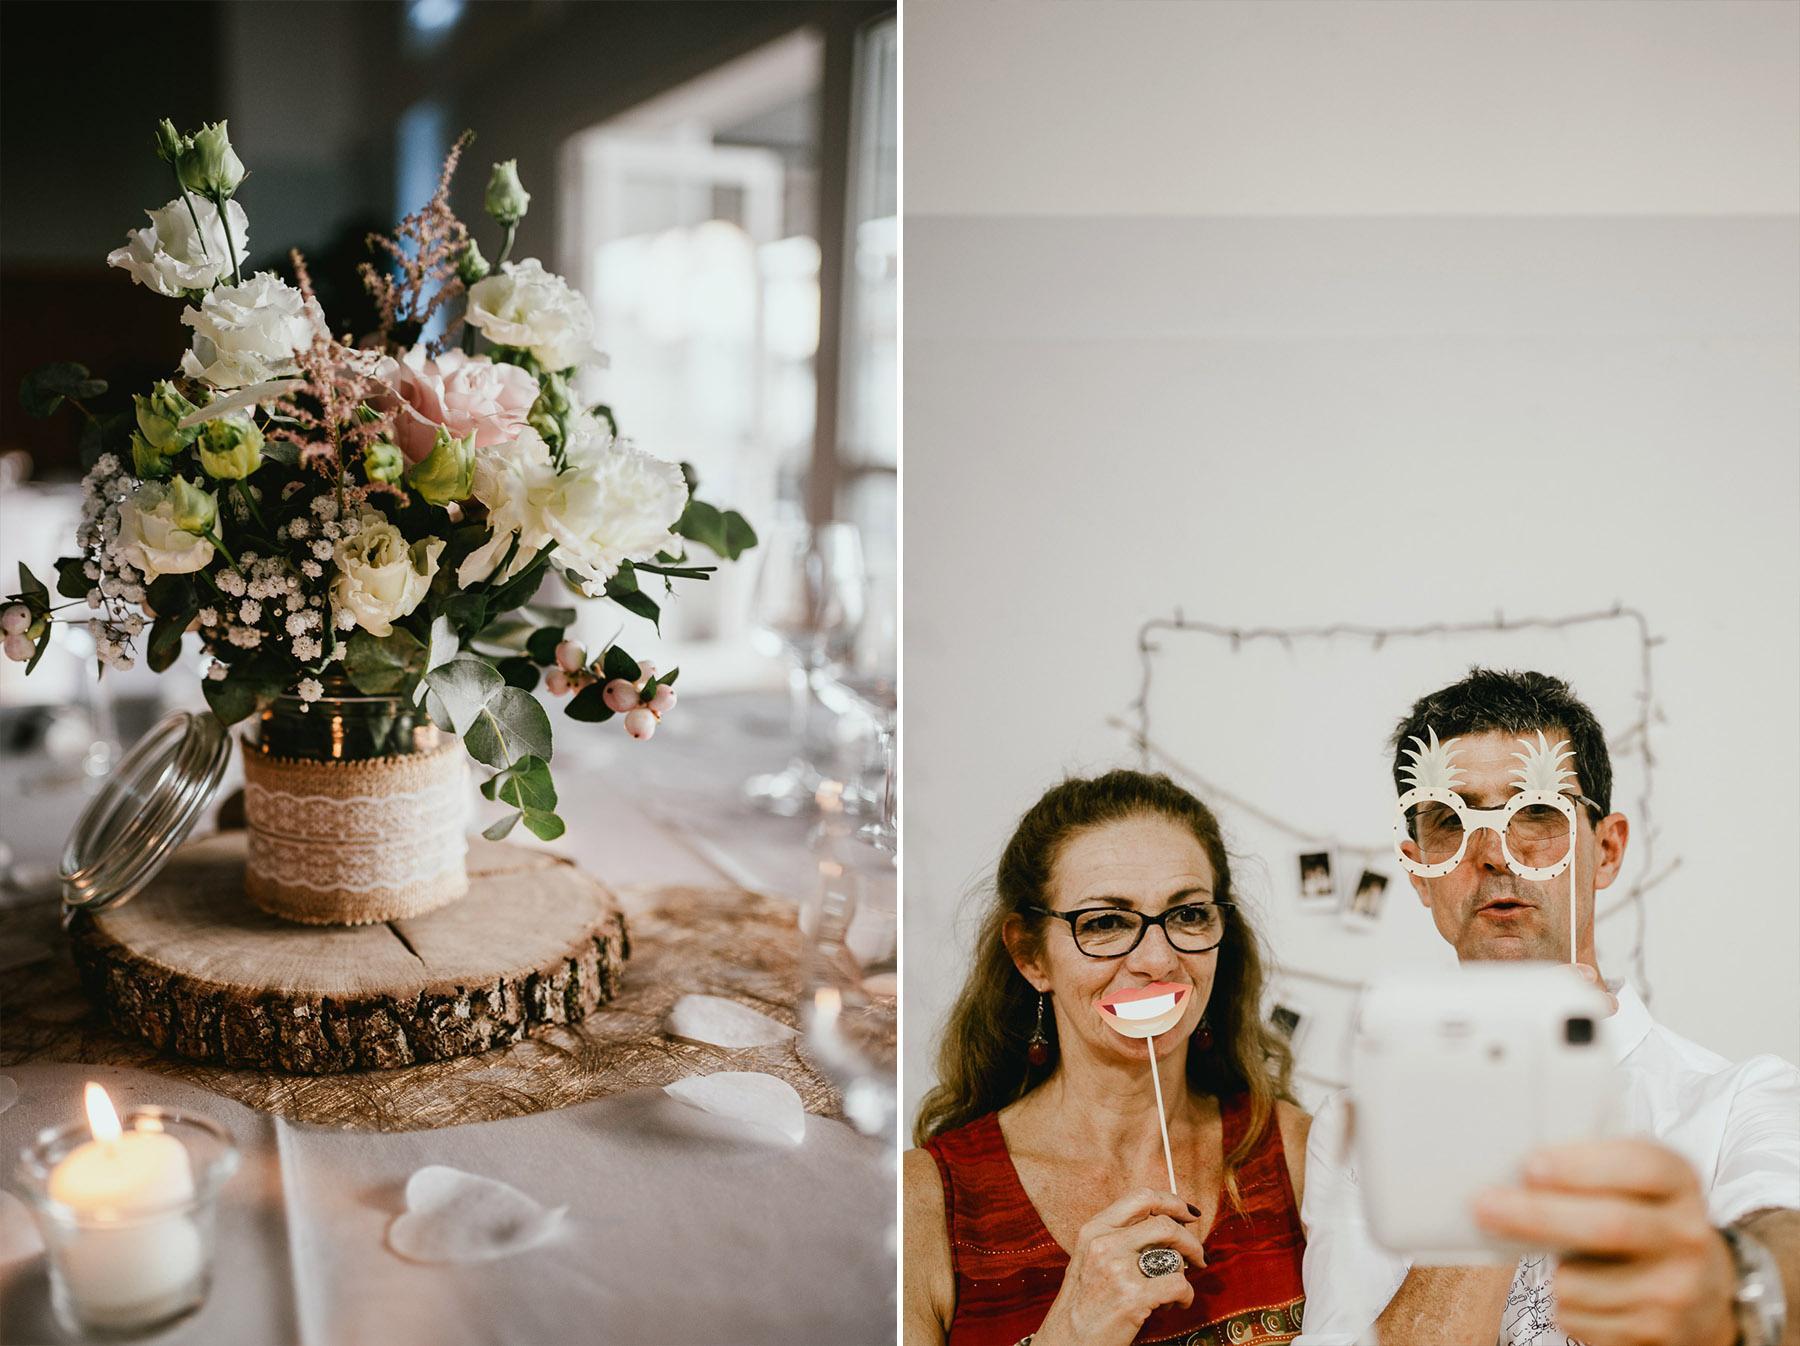 Photographe mariage landes dax aquitaine 15